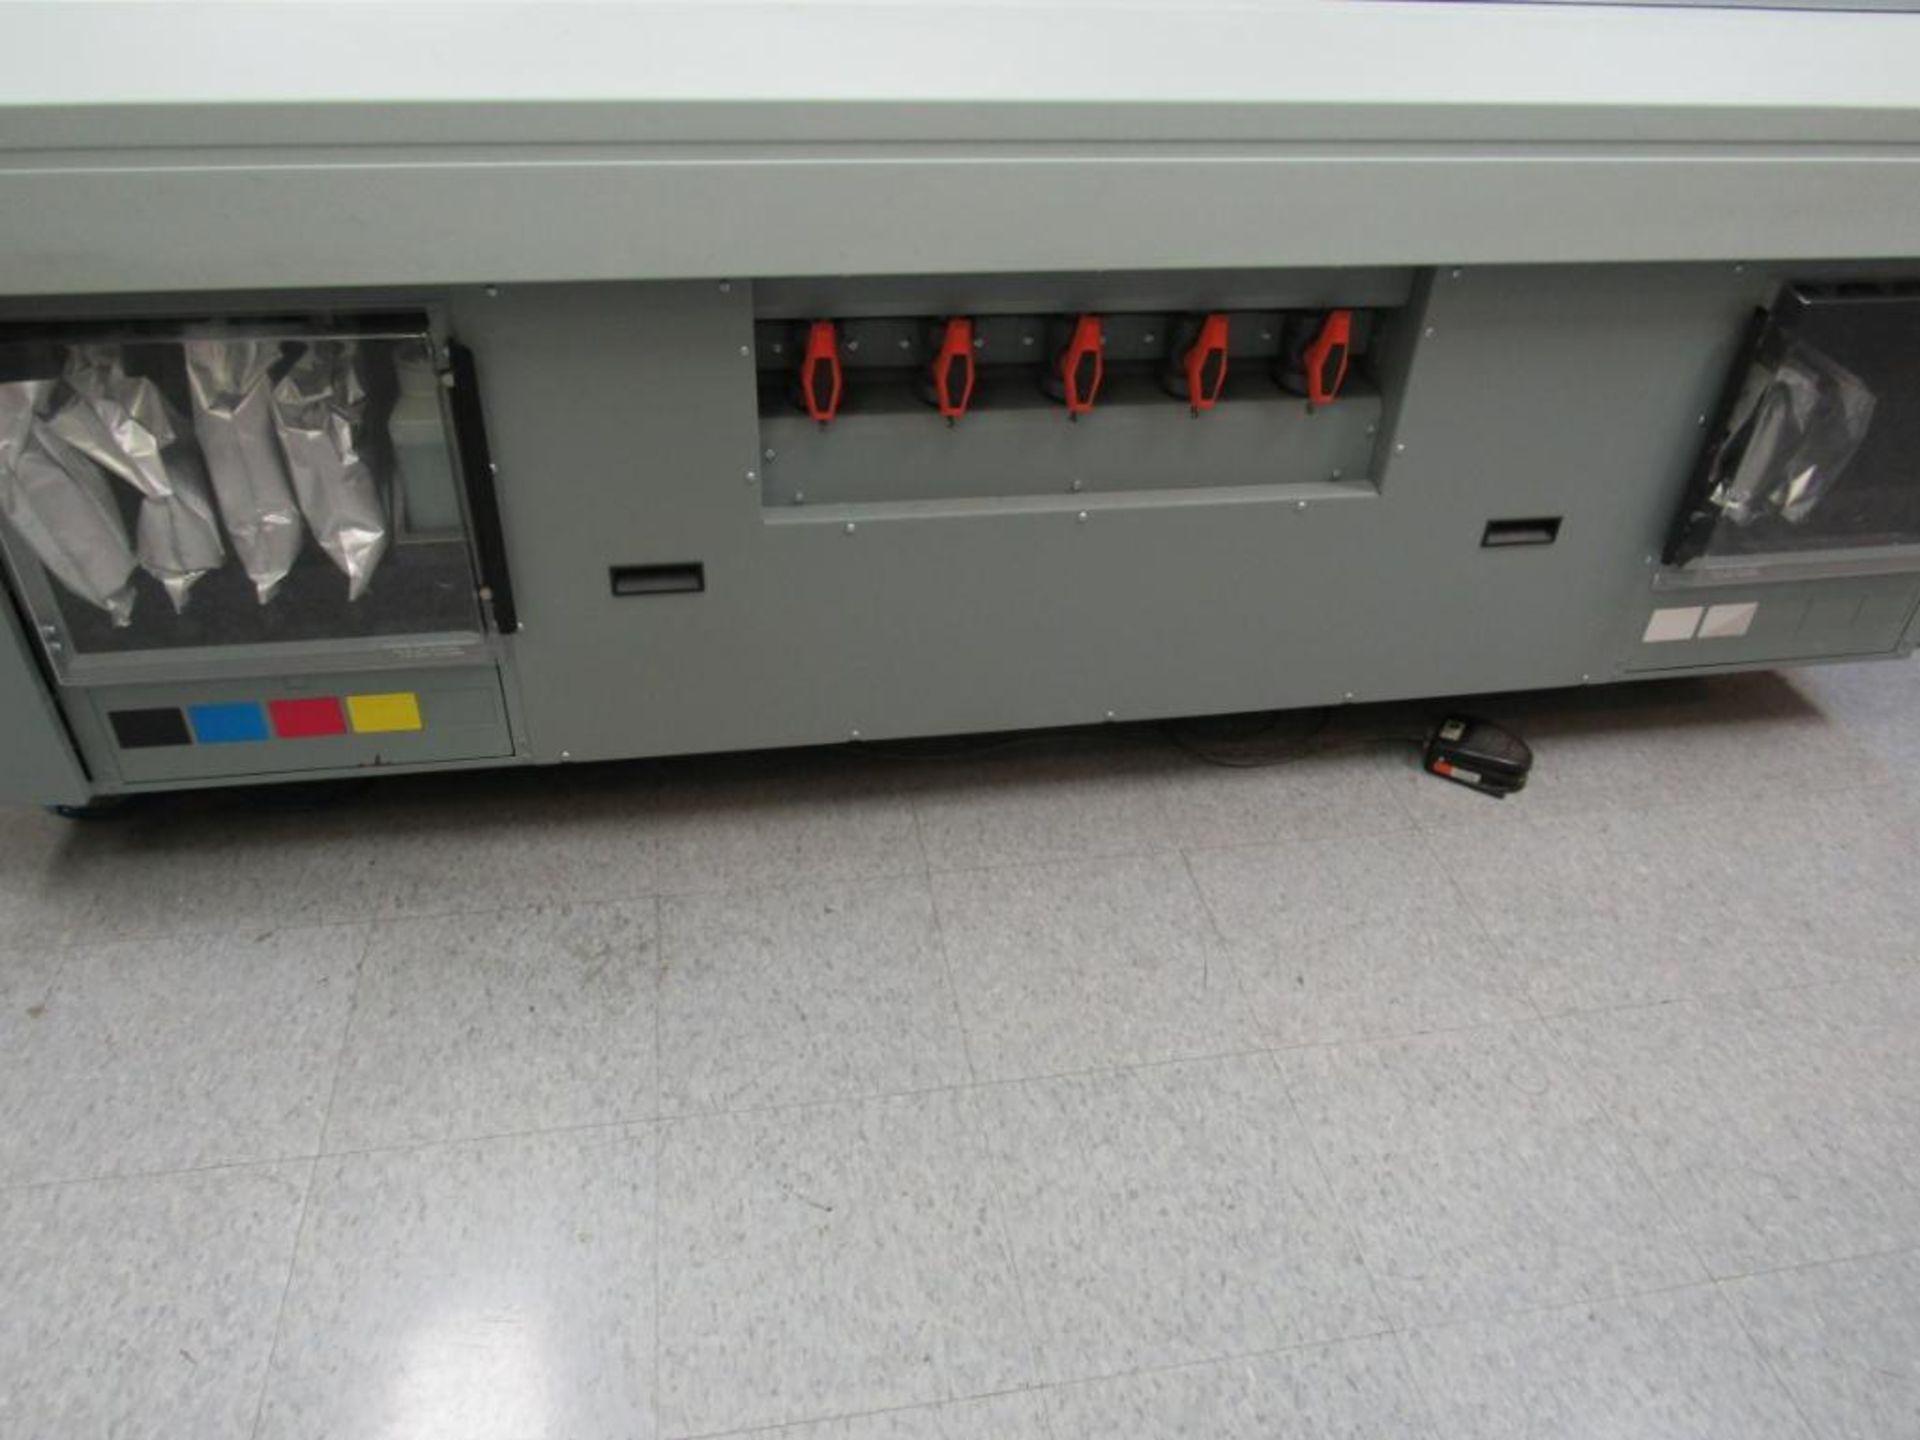 2018 OCE Arizona 2260 GT, High Volume UV Flatbed Printer, 6-Ink Channels, 49 in. x 98.4 in. Rigid - Image 3 of 6